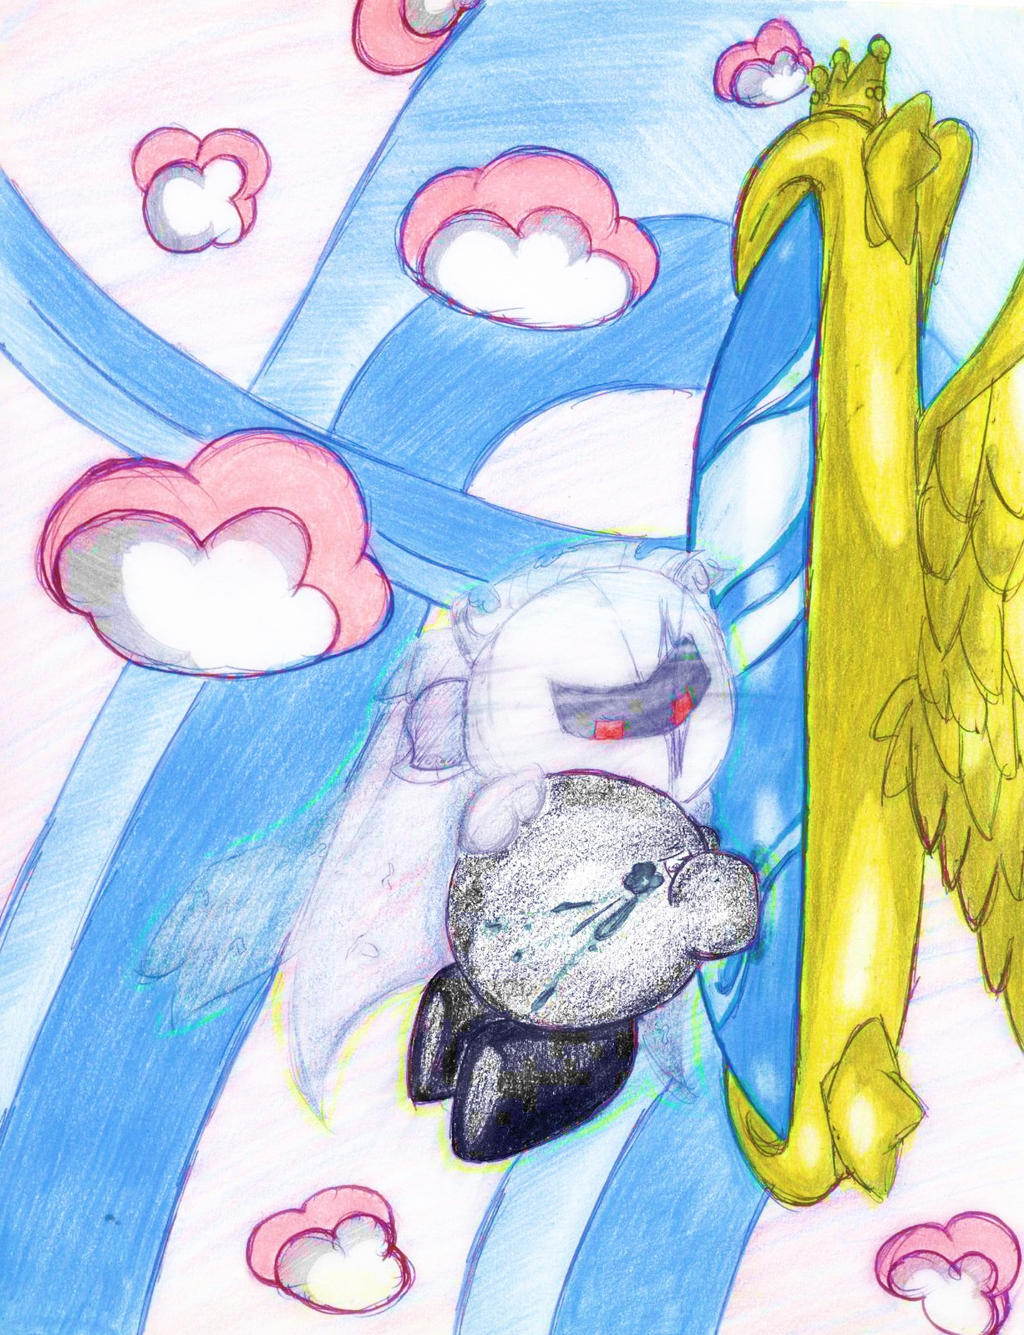 Dark Meta Knight And Shadow Kirby by SonirbyLovS on DeviantArt